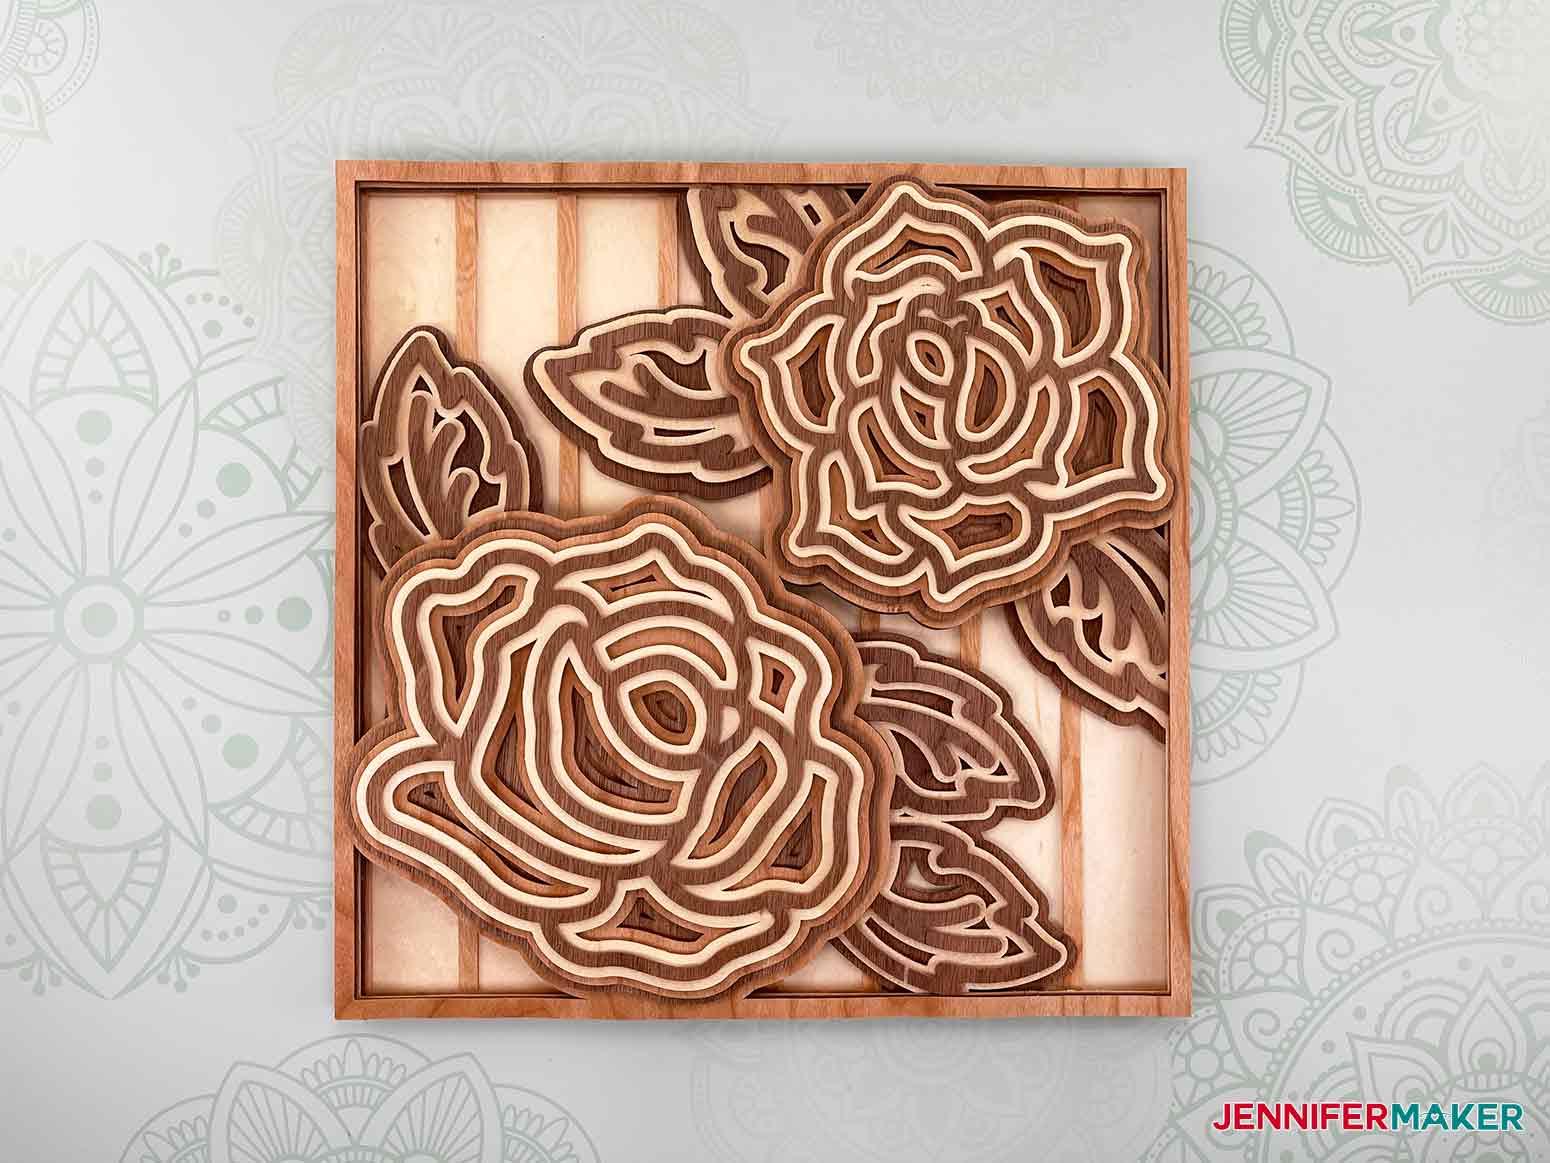 This is what my layered mandala rose 3d looks like using Cricut veneer